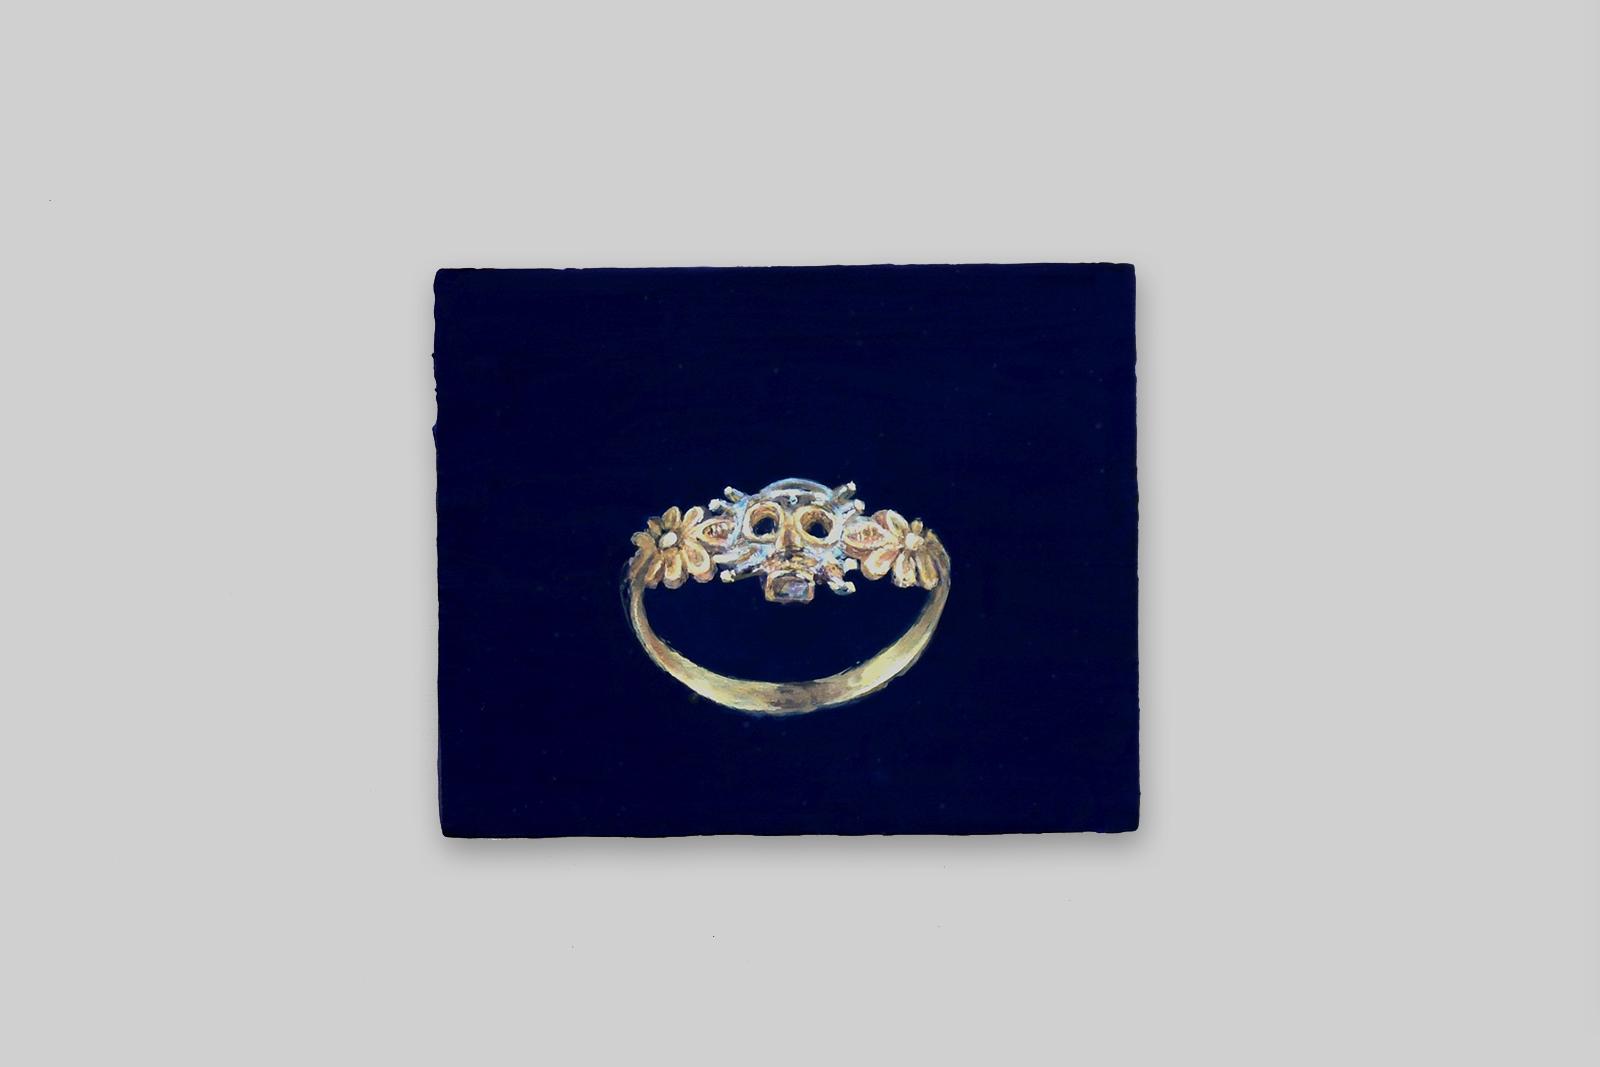 'memento mori ring', 2011, tempera/paneel, 14,5 x 18 cm